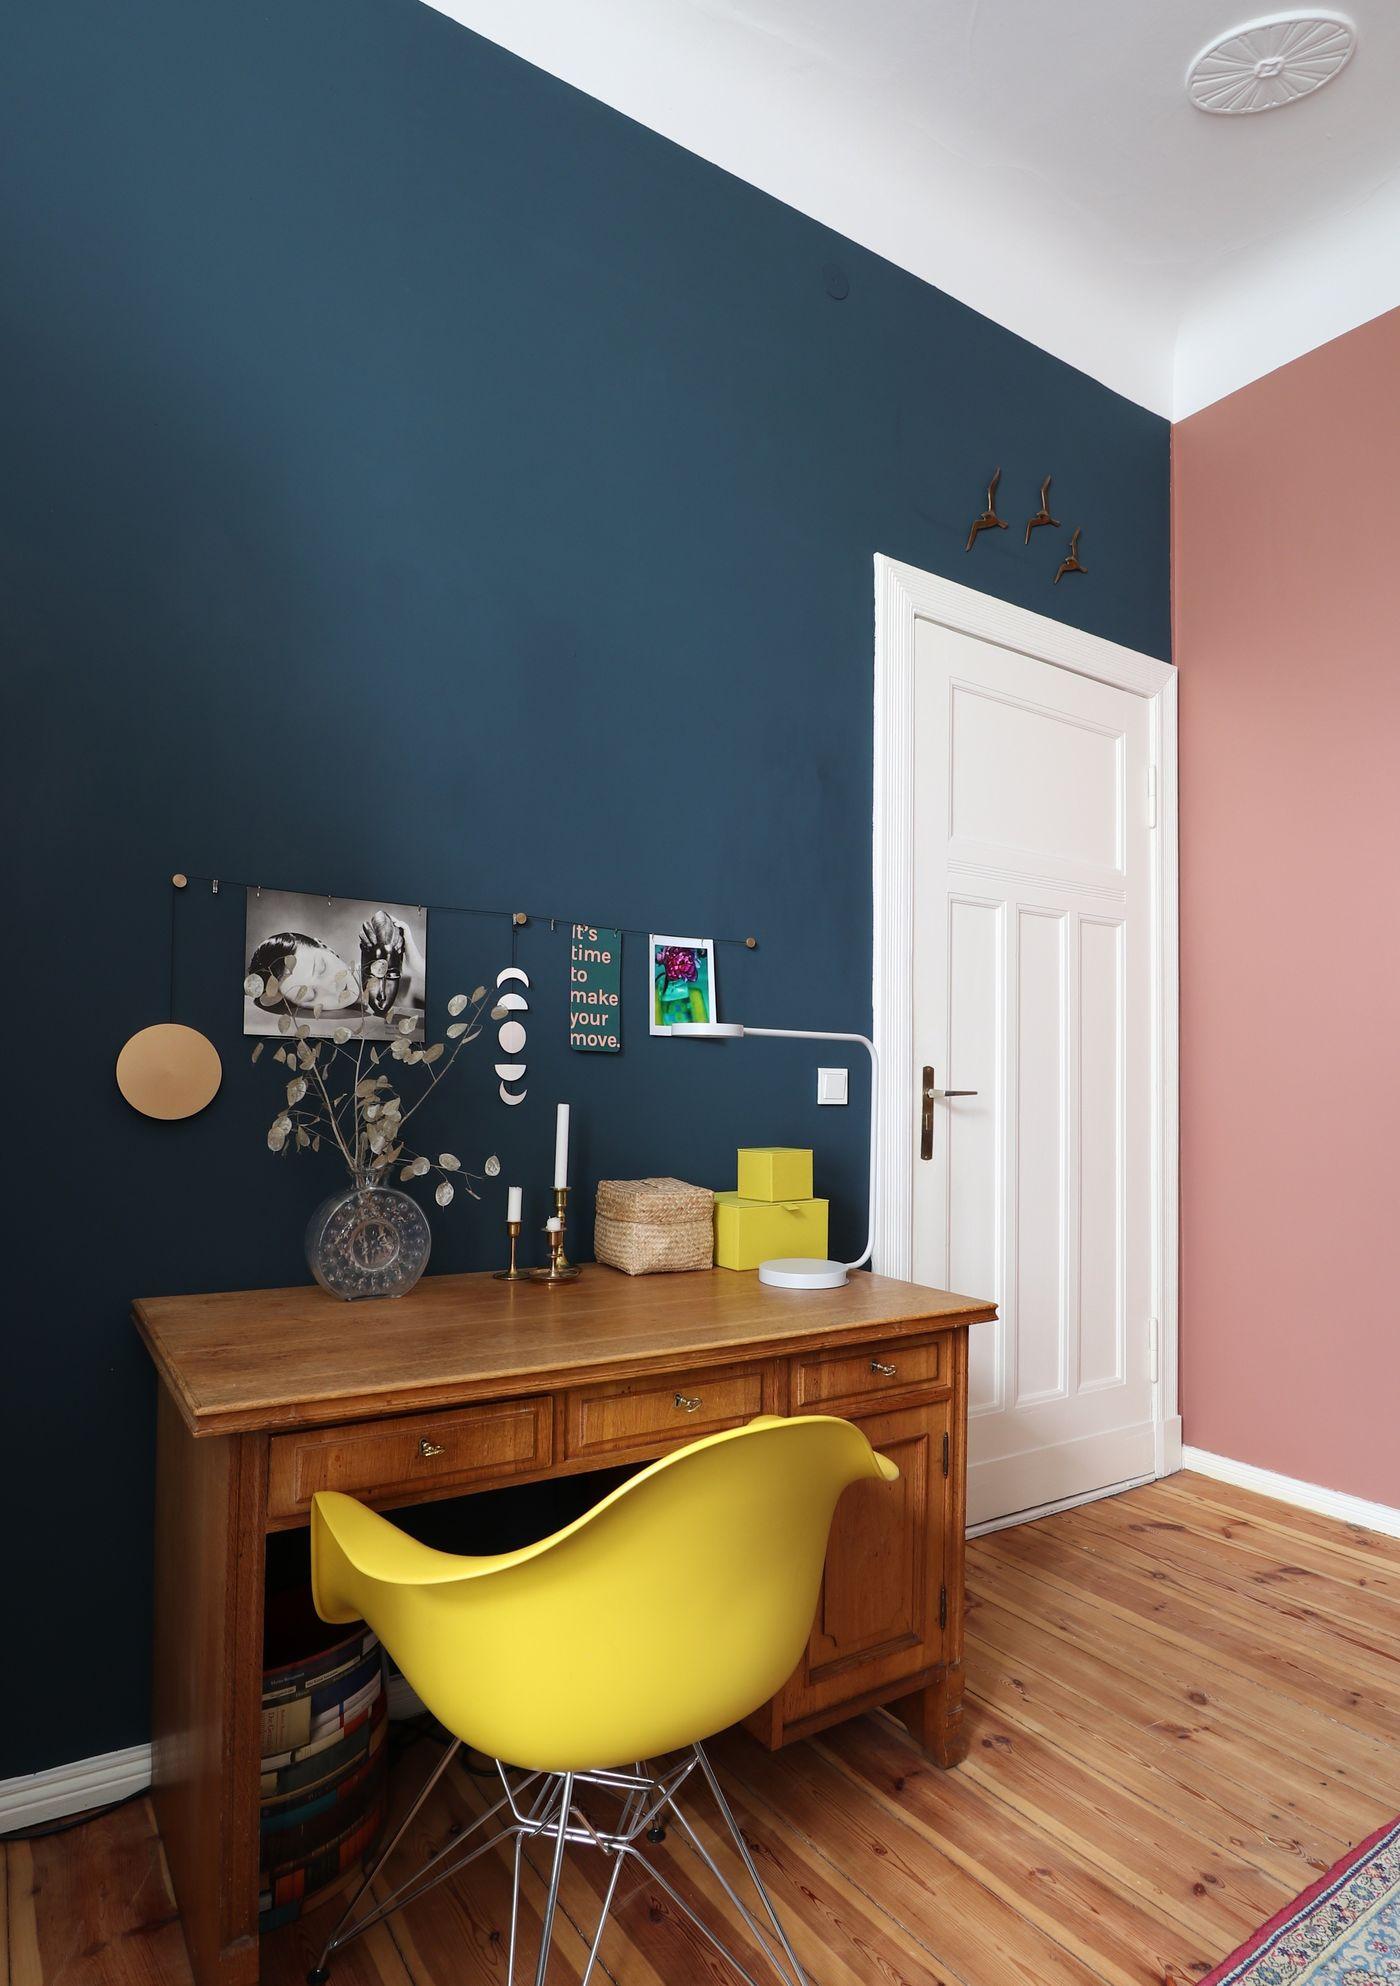 Wandfarbe Altrosa Rosa Die Schonsten Ideen